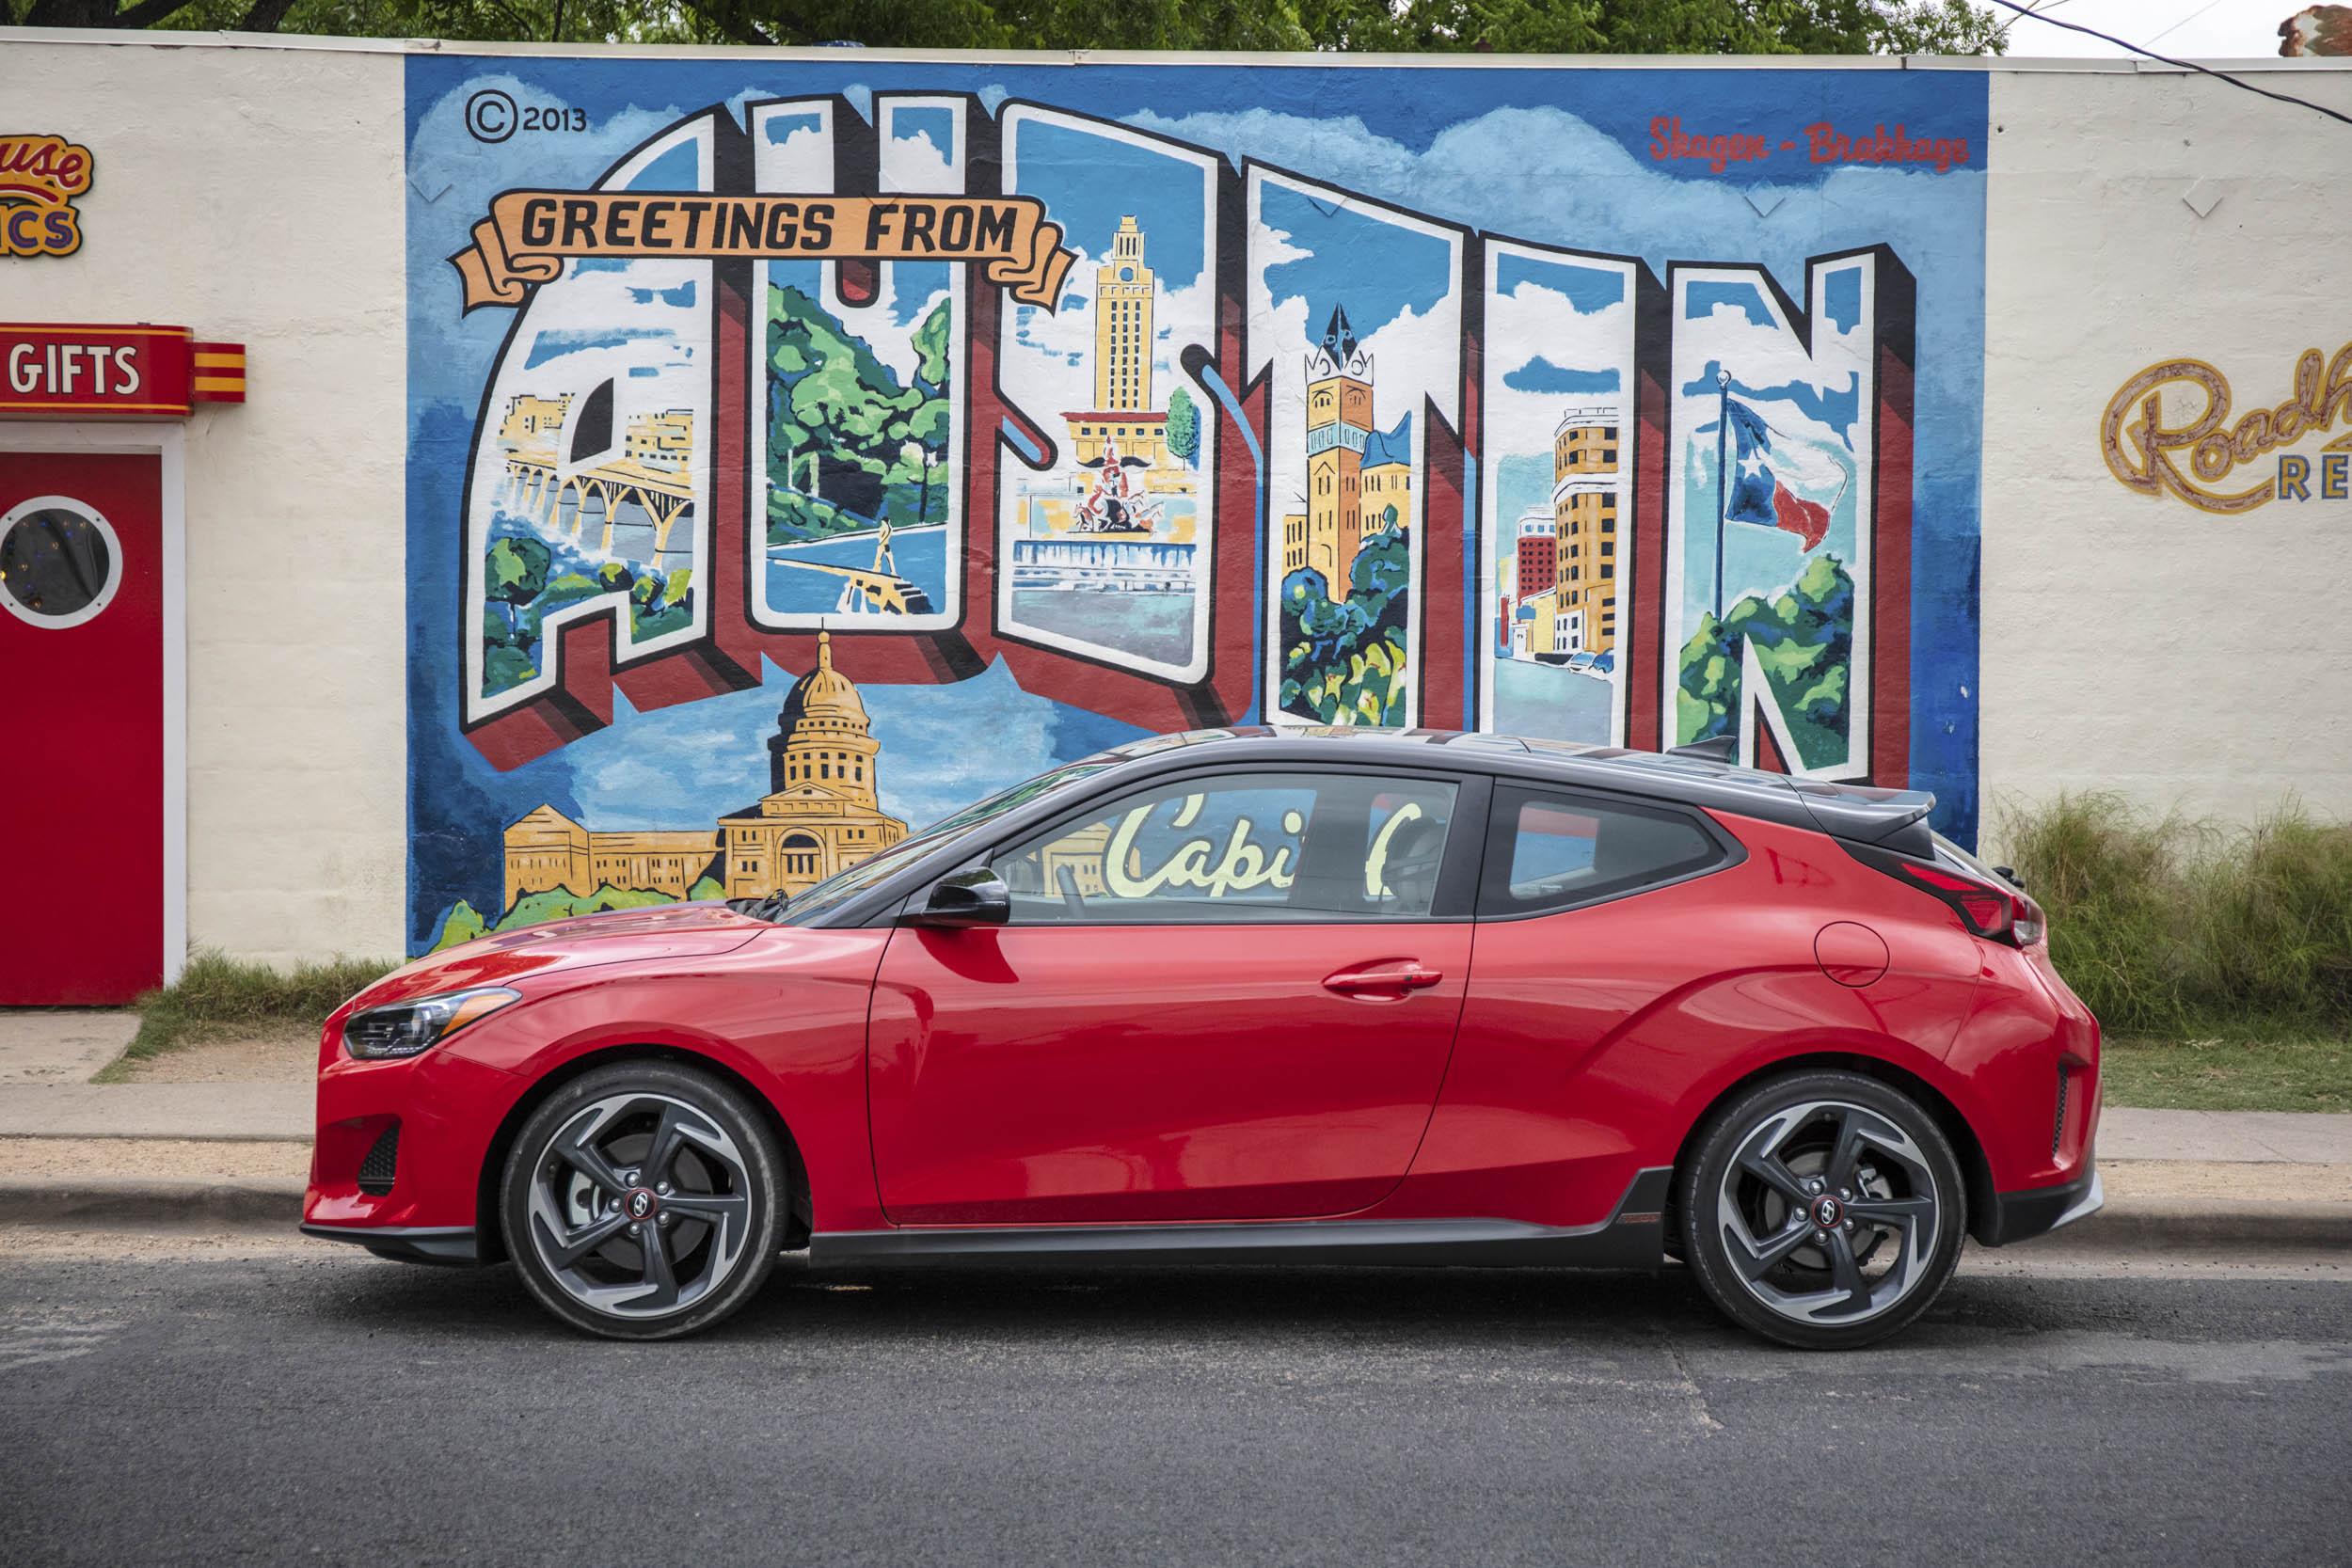 greetings from Austin Texas Hyundai Veloster